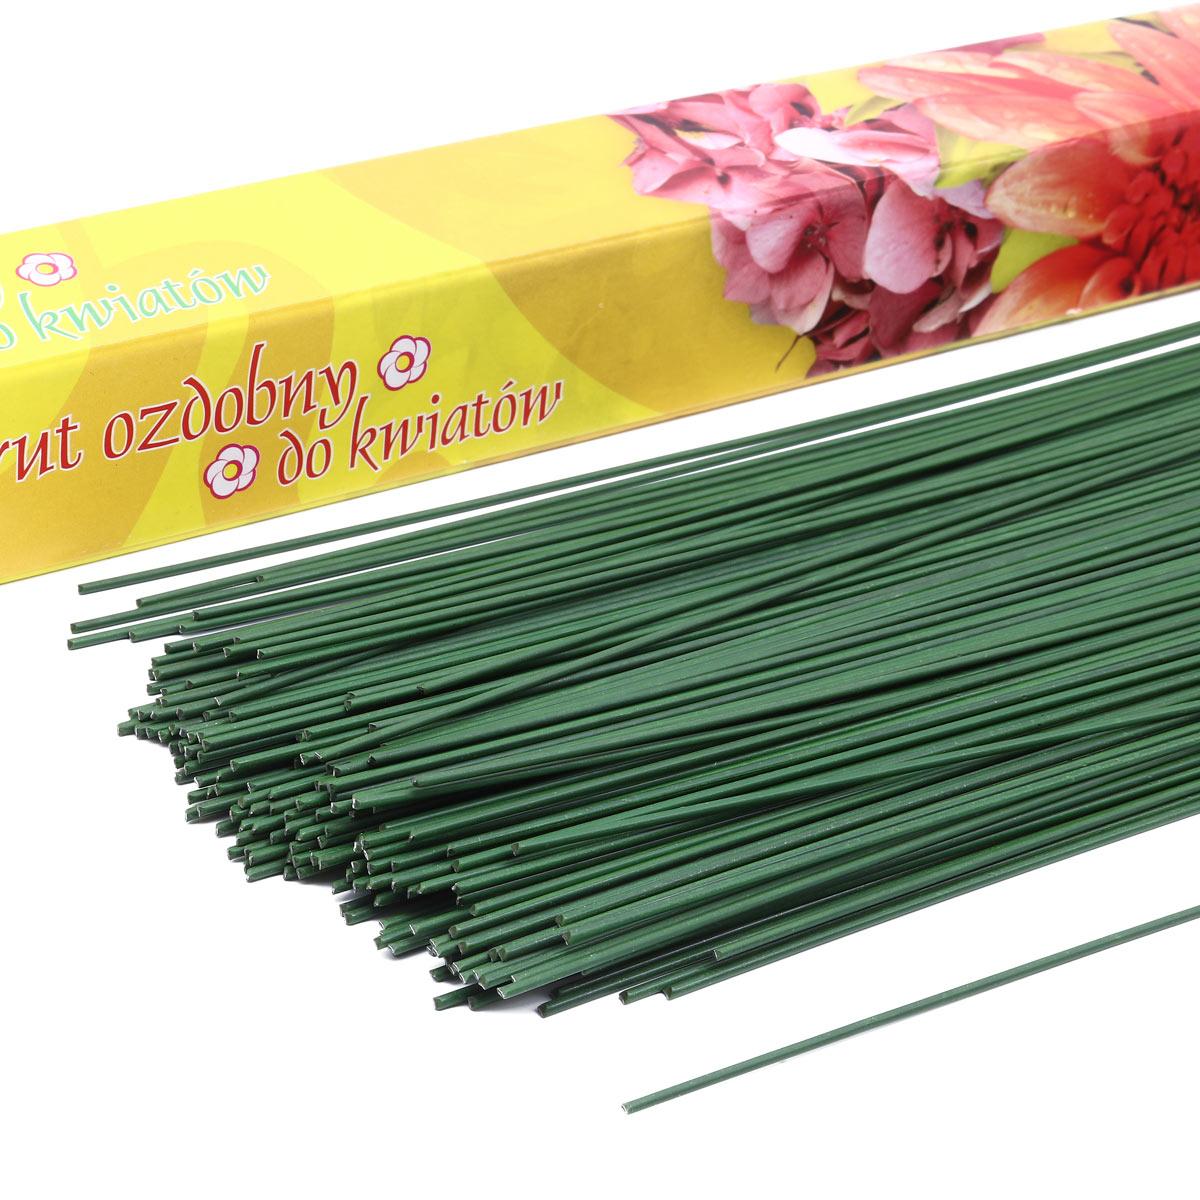 12646981 Проволока для цветов 1кг*1,4мм